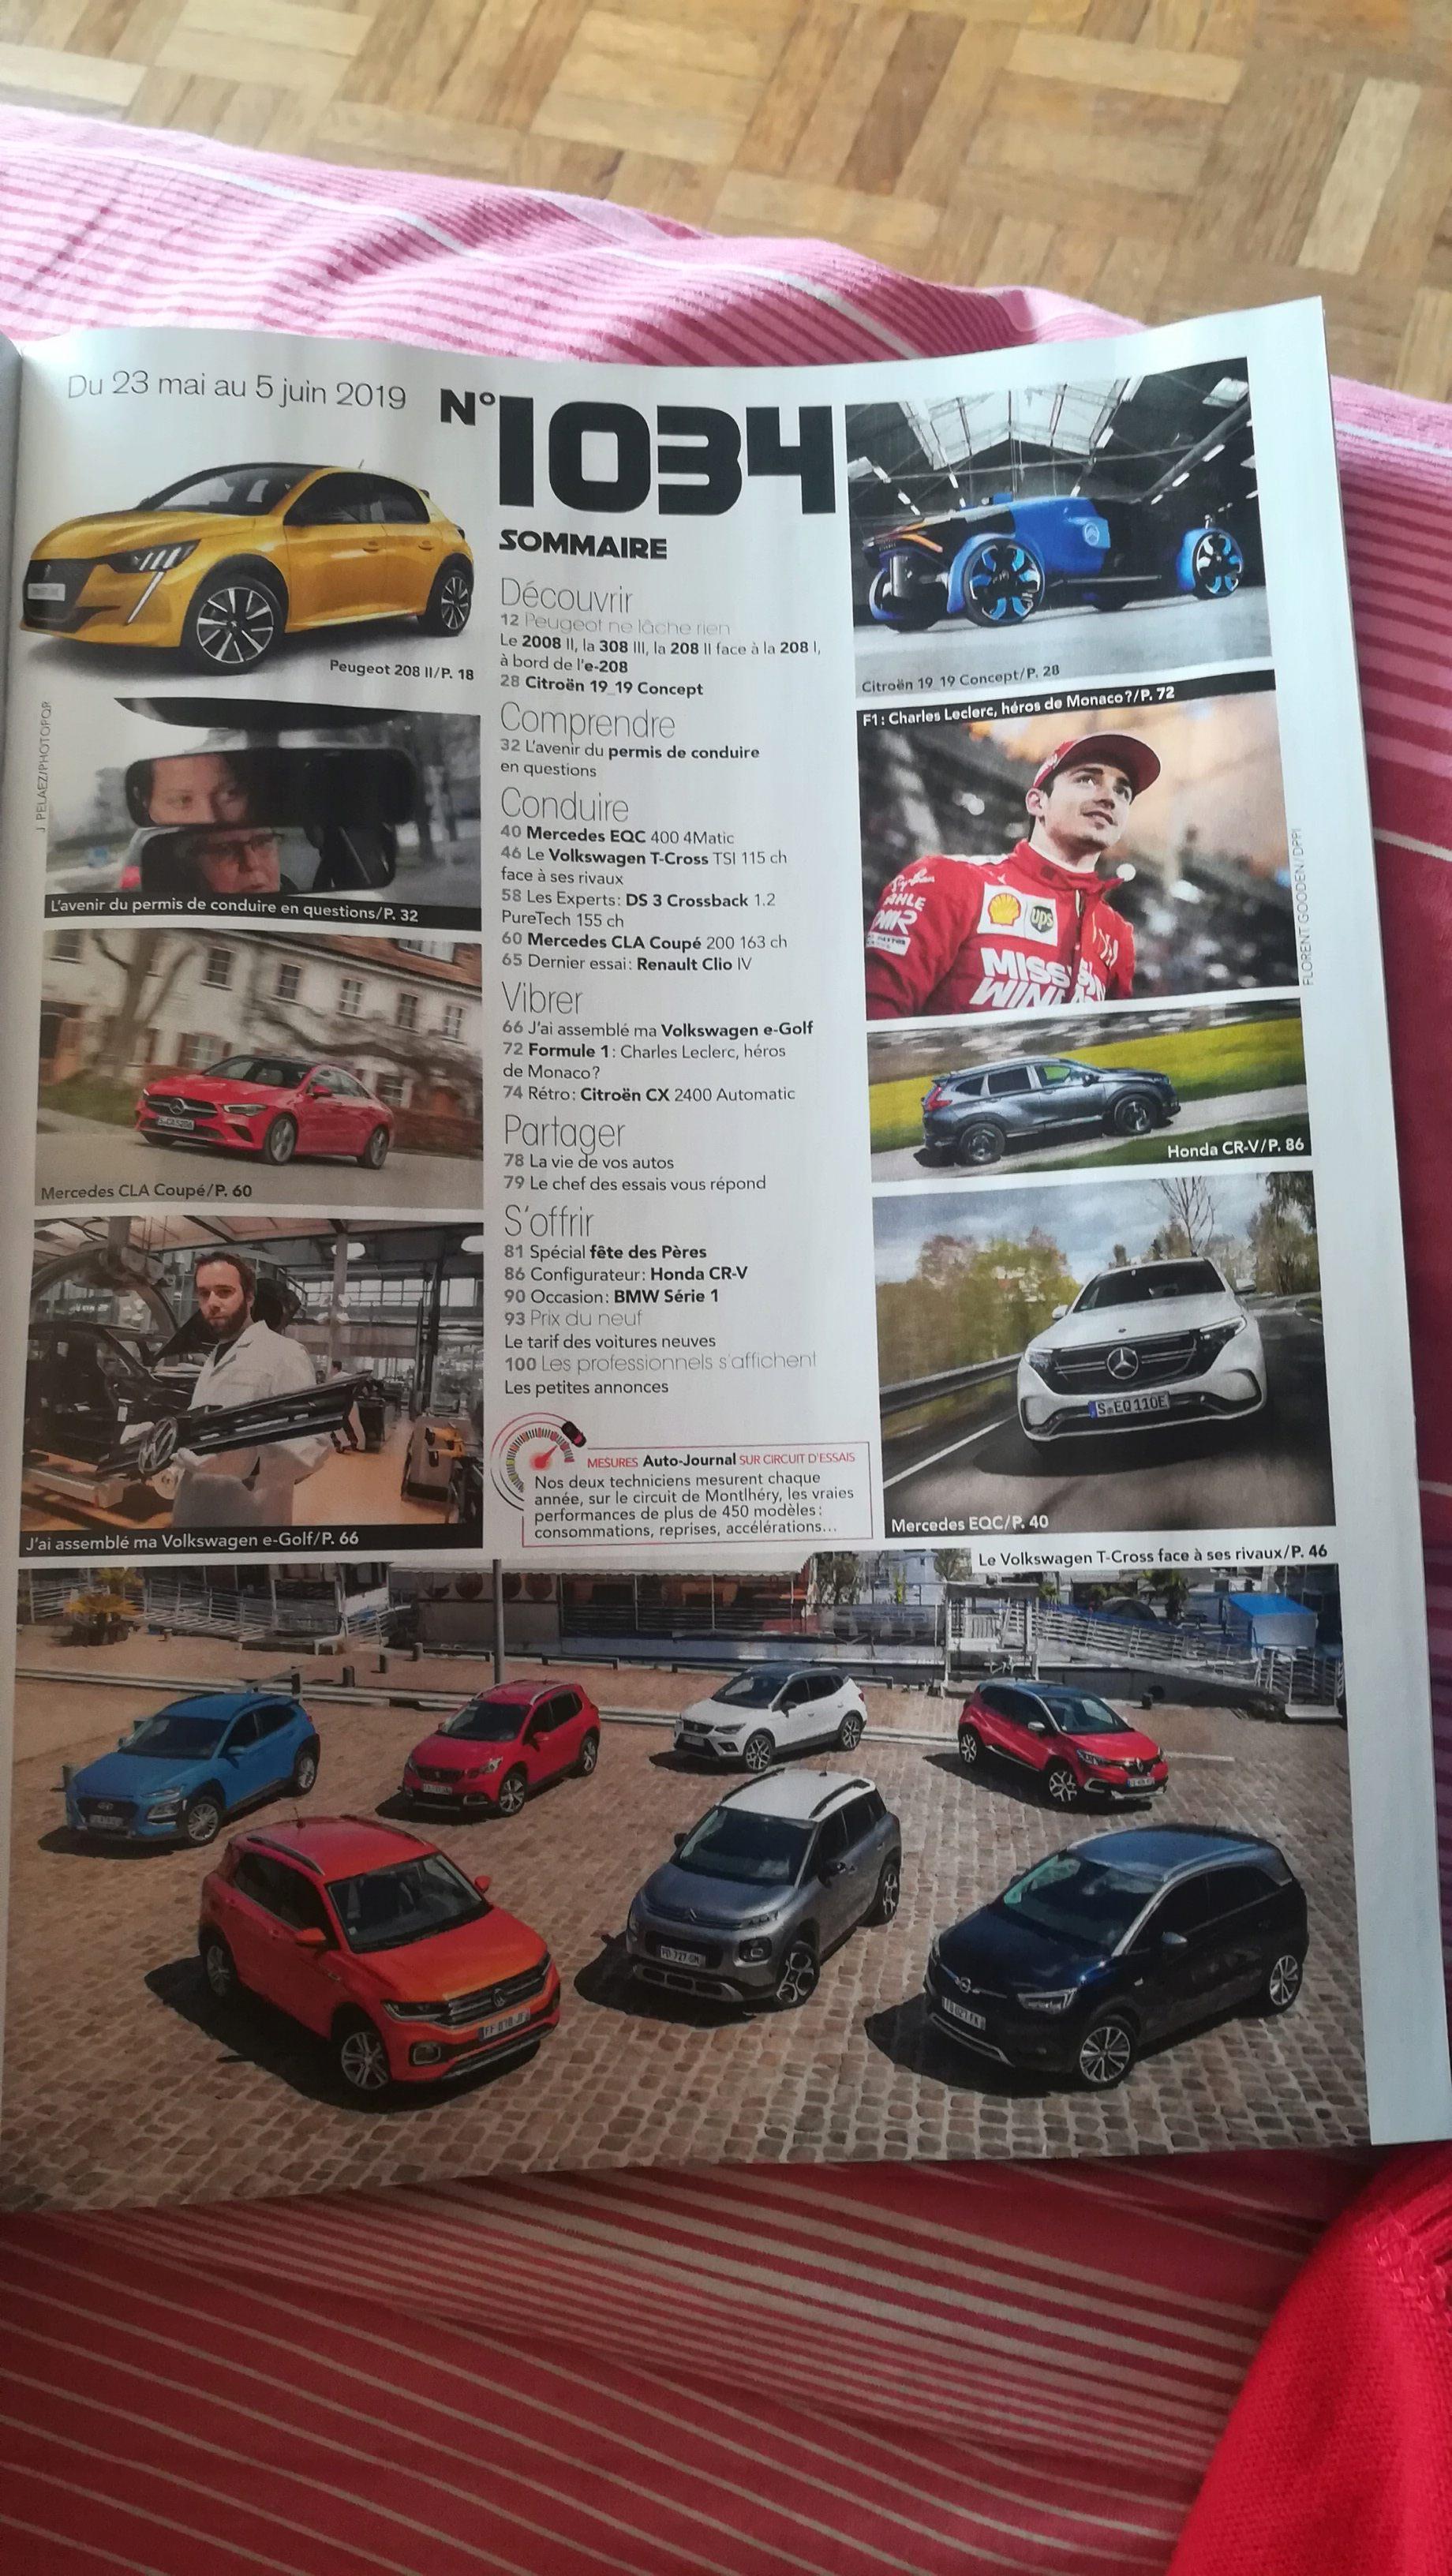 [Presse] Les magazines auto ! - Page 17 Img_2103